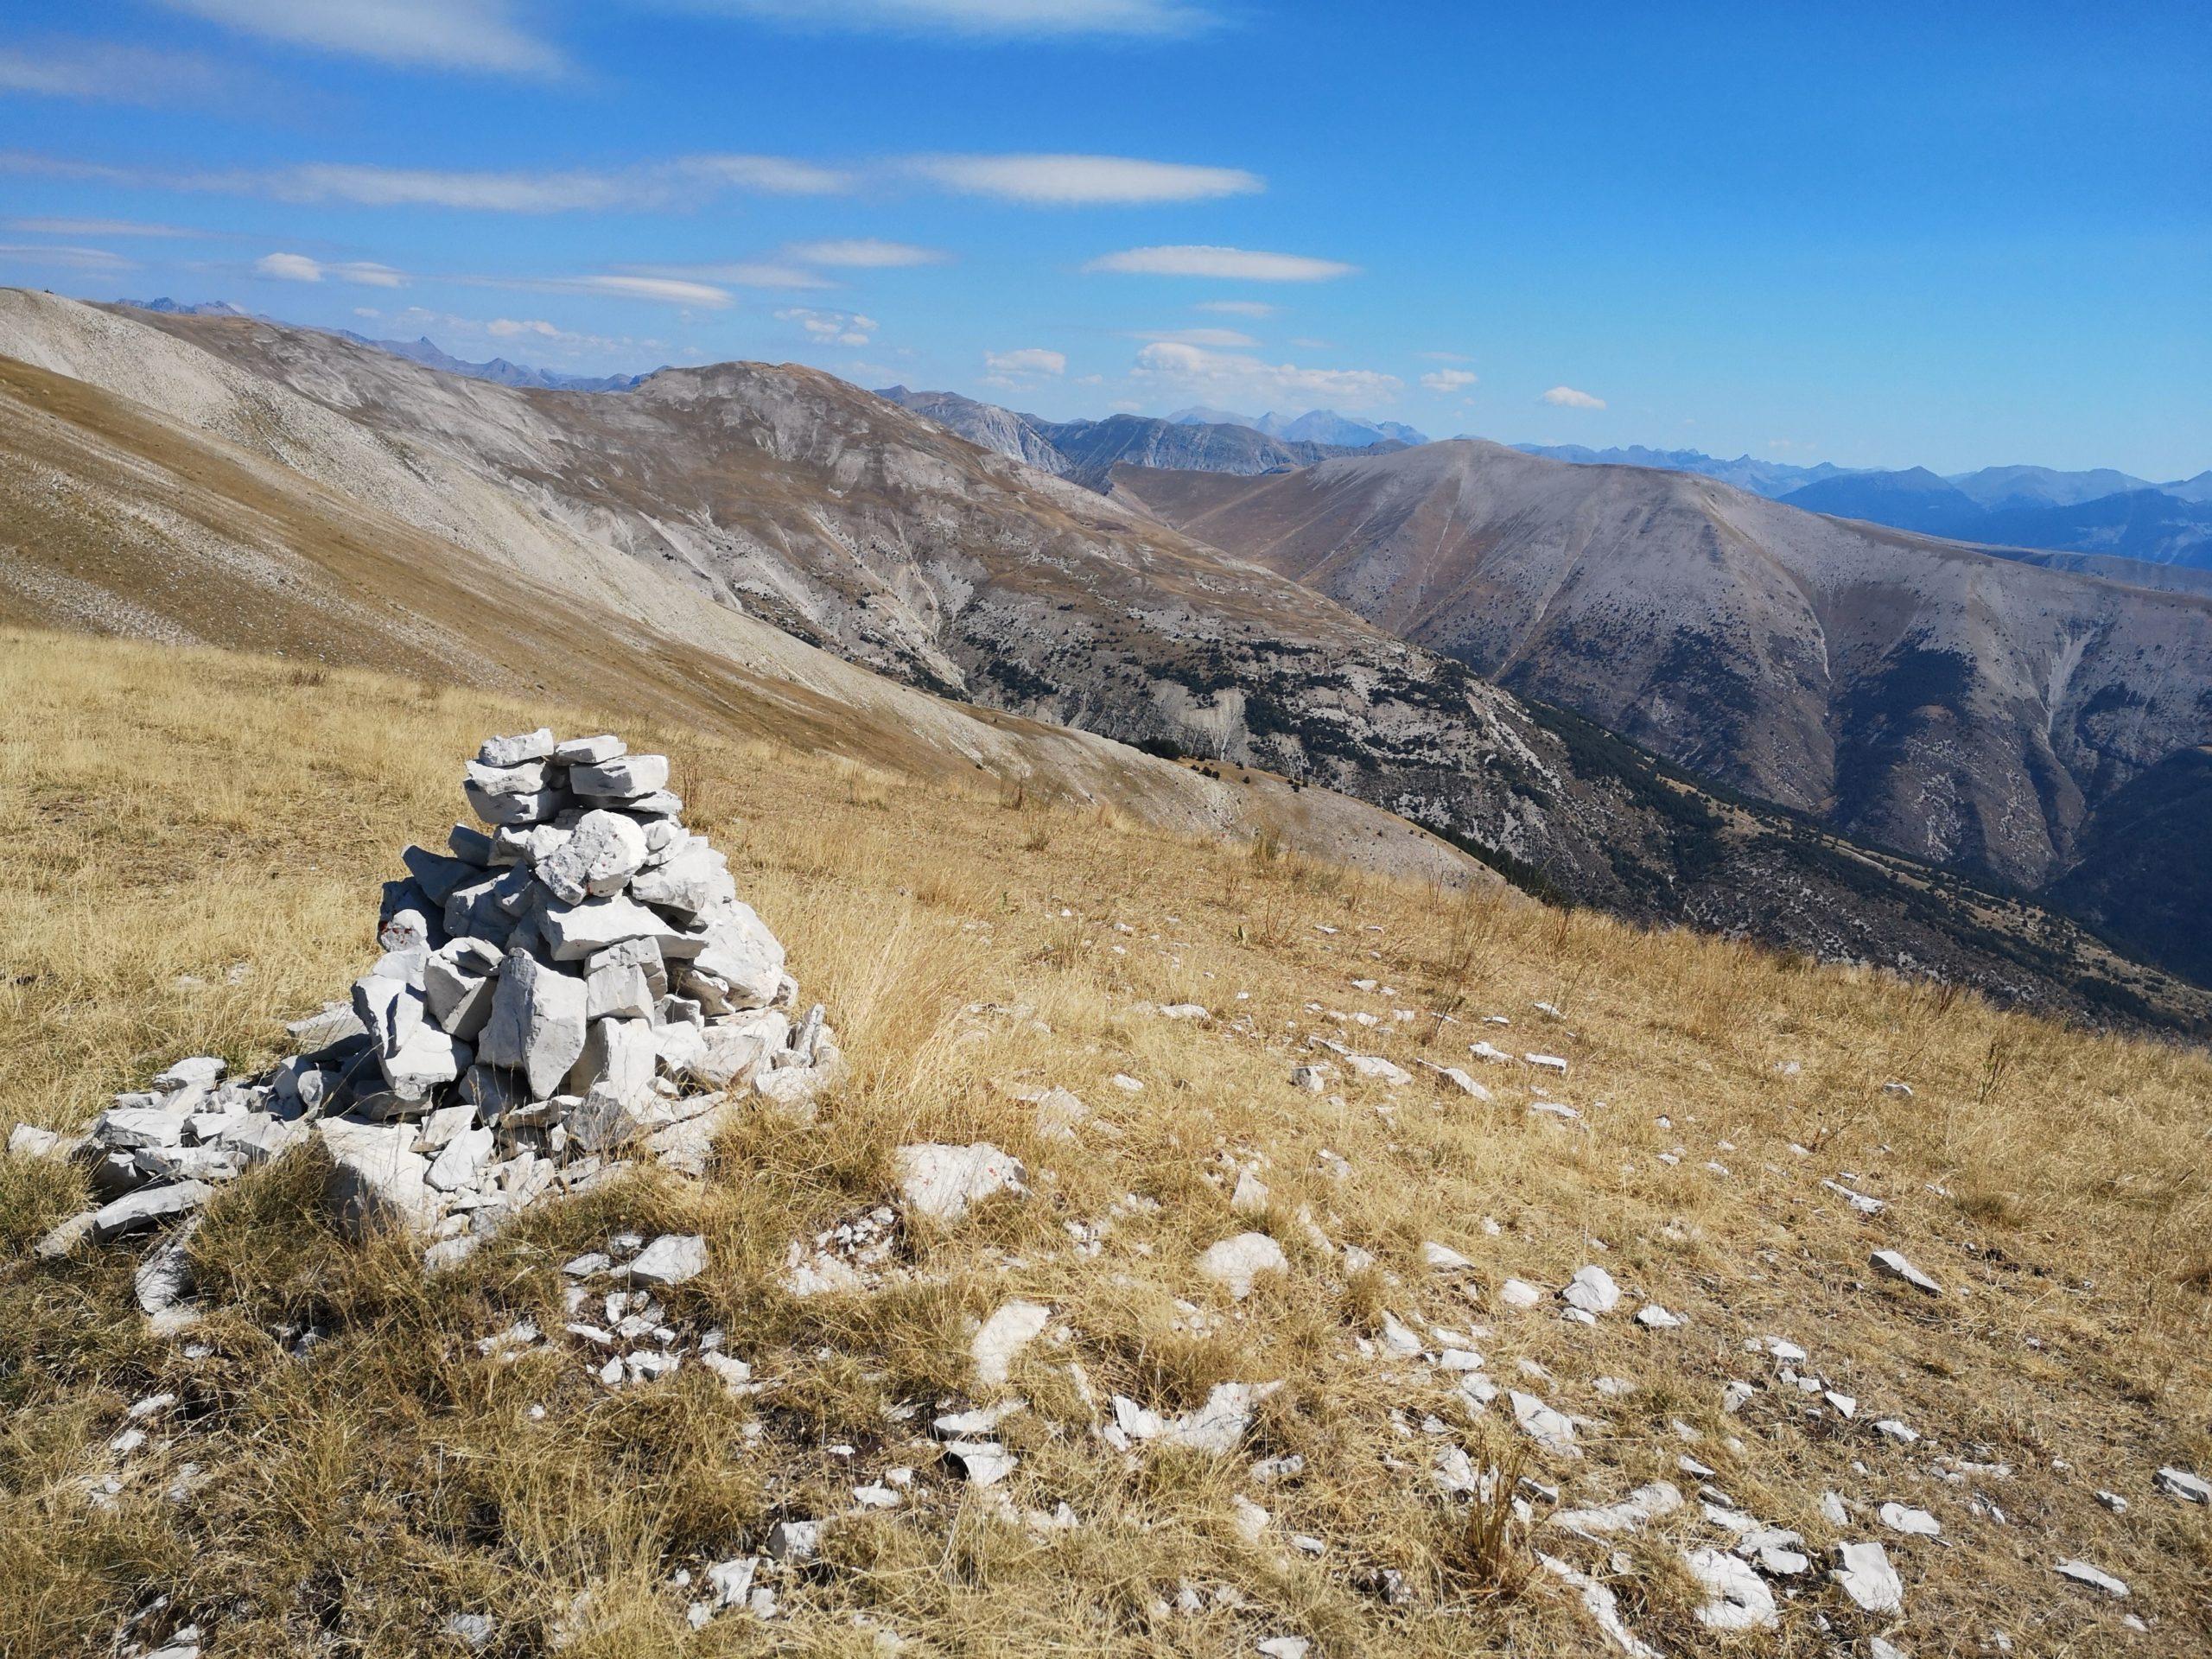 Alpage du Cheval-Blanc, 2300 m, Thorame-Basse, 18 août 2019